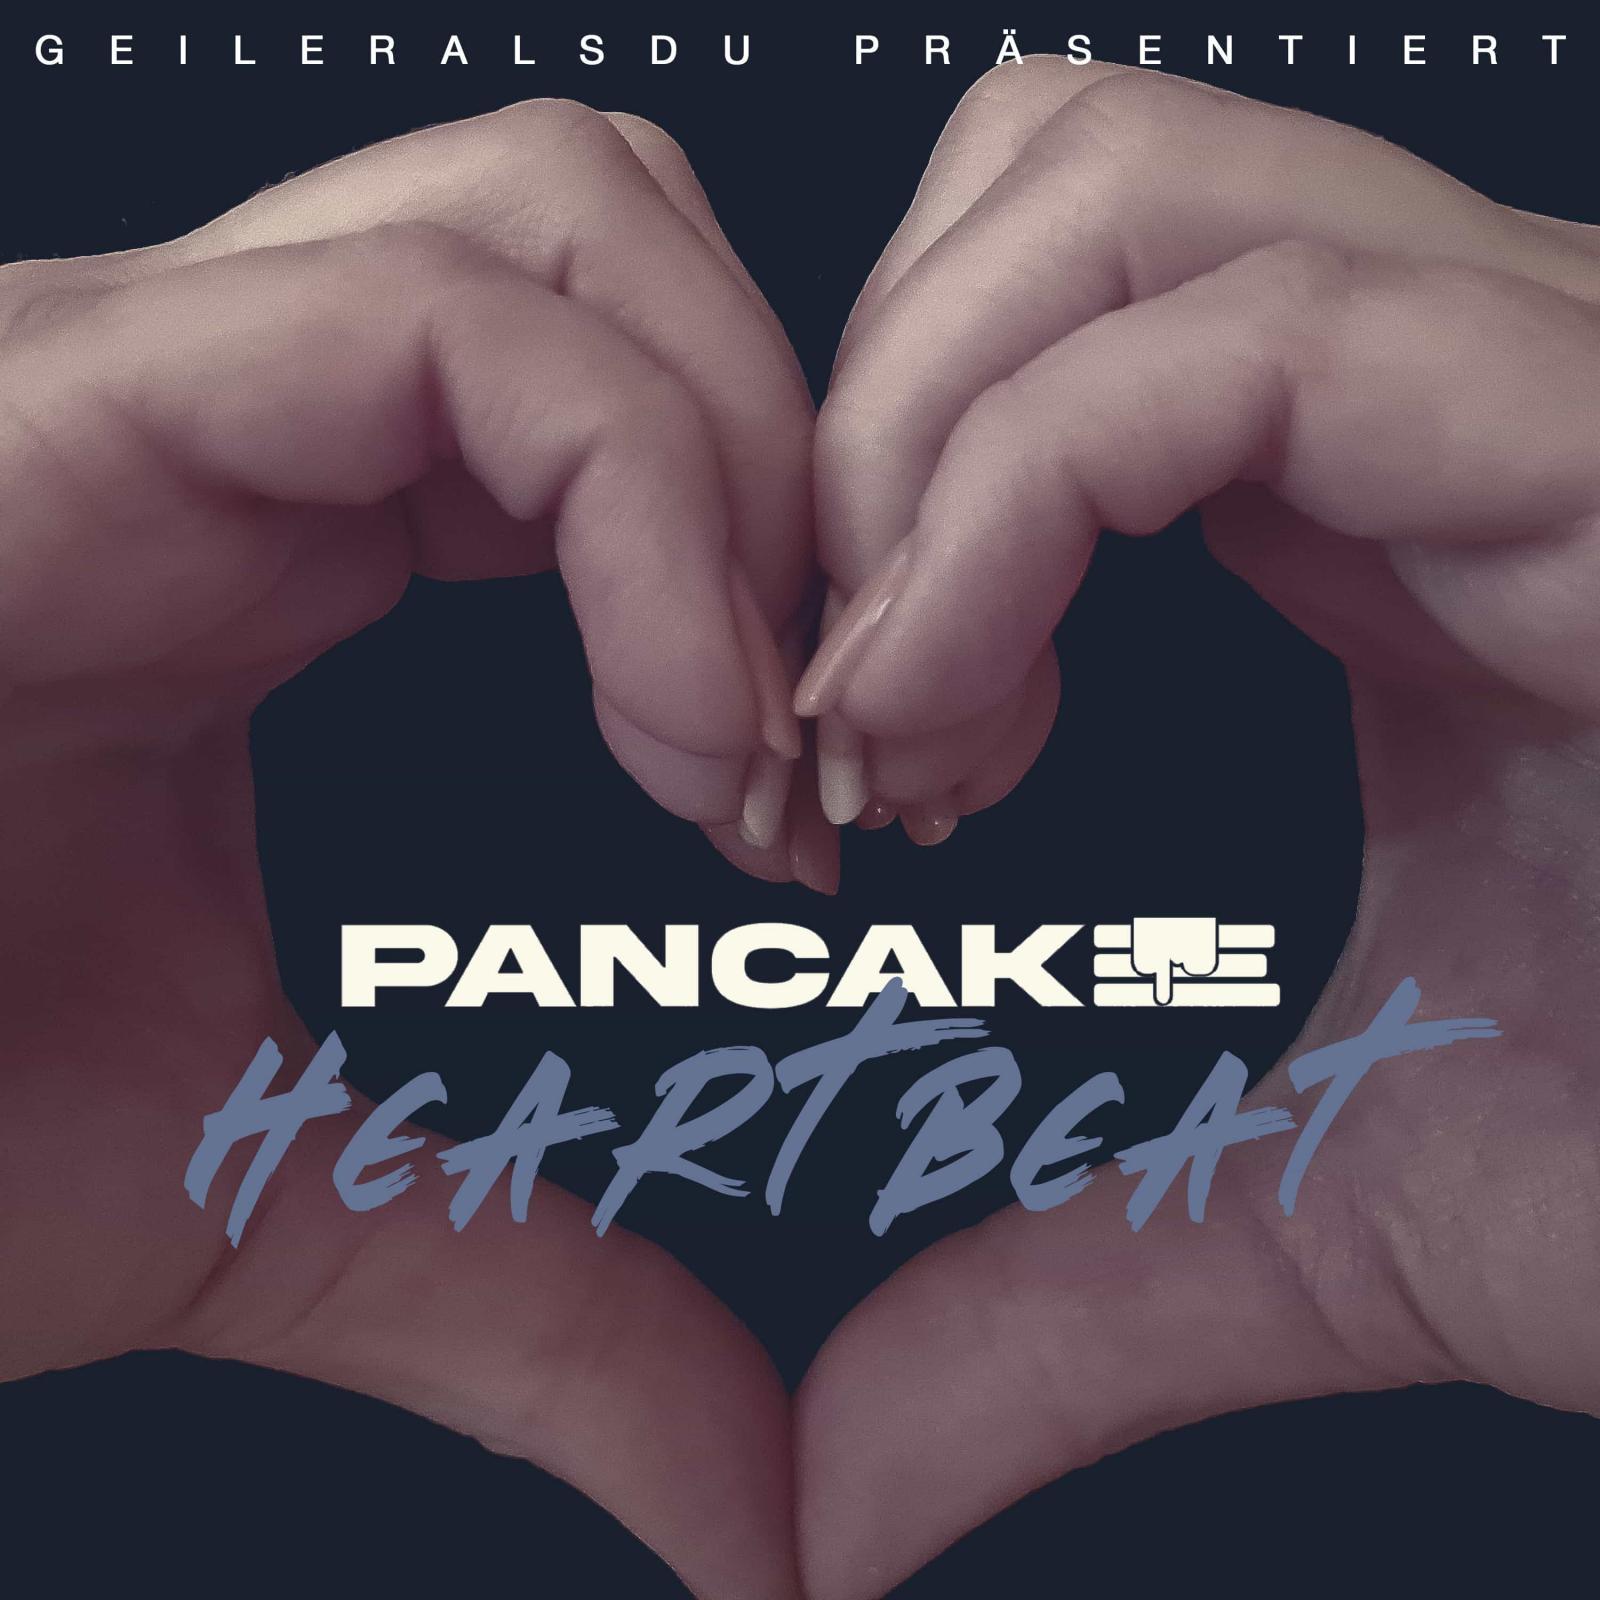 Upcoming: Pancake - Heartbeat